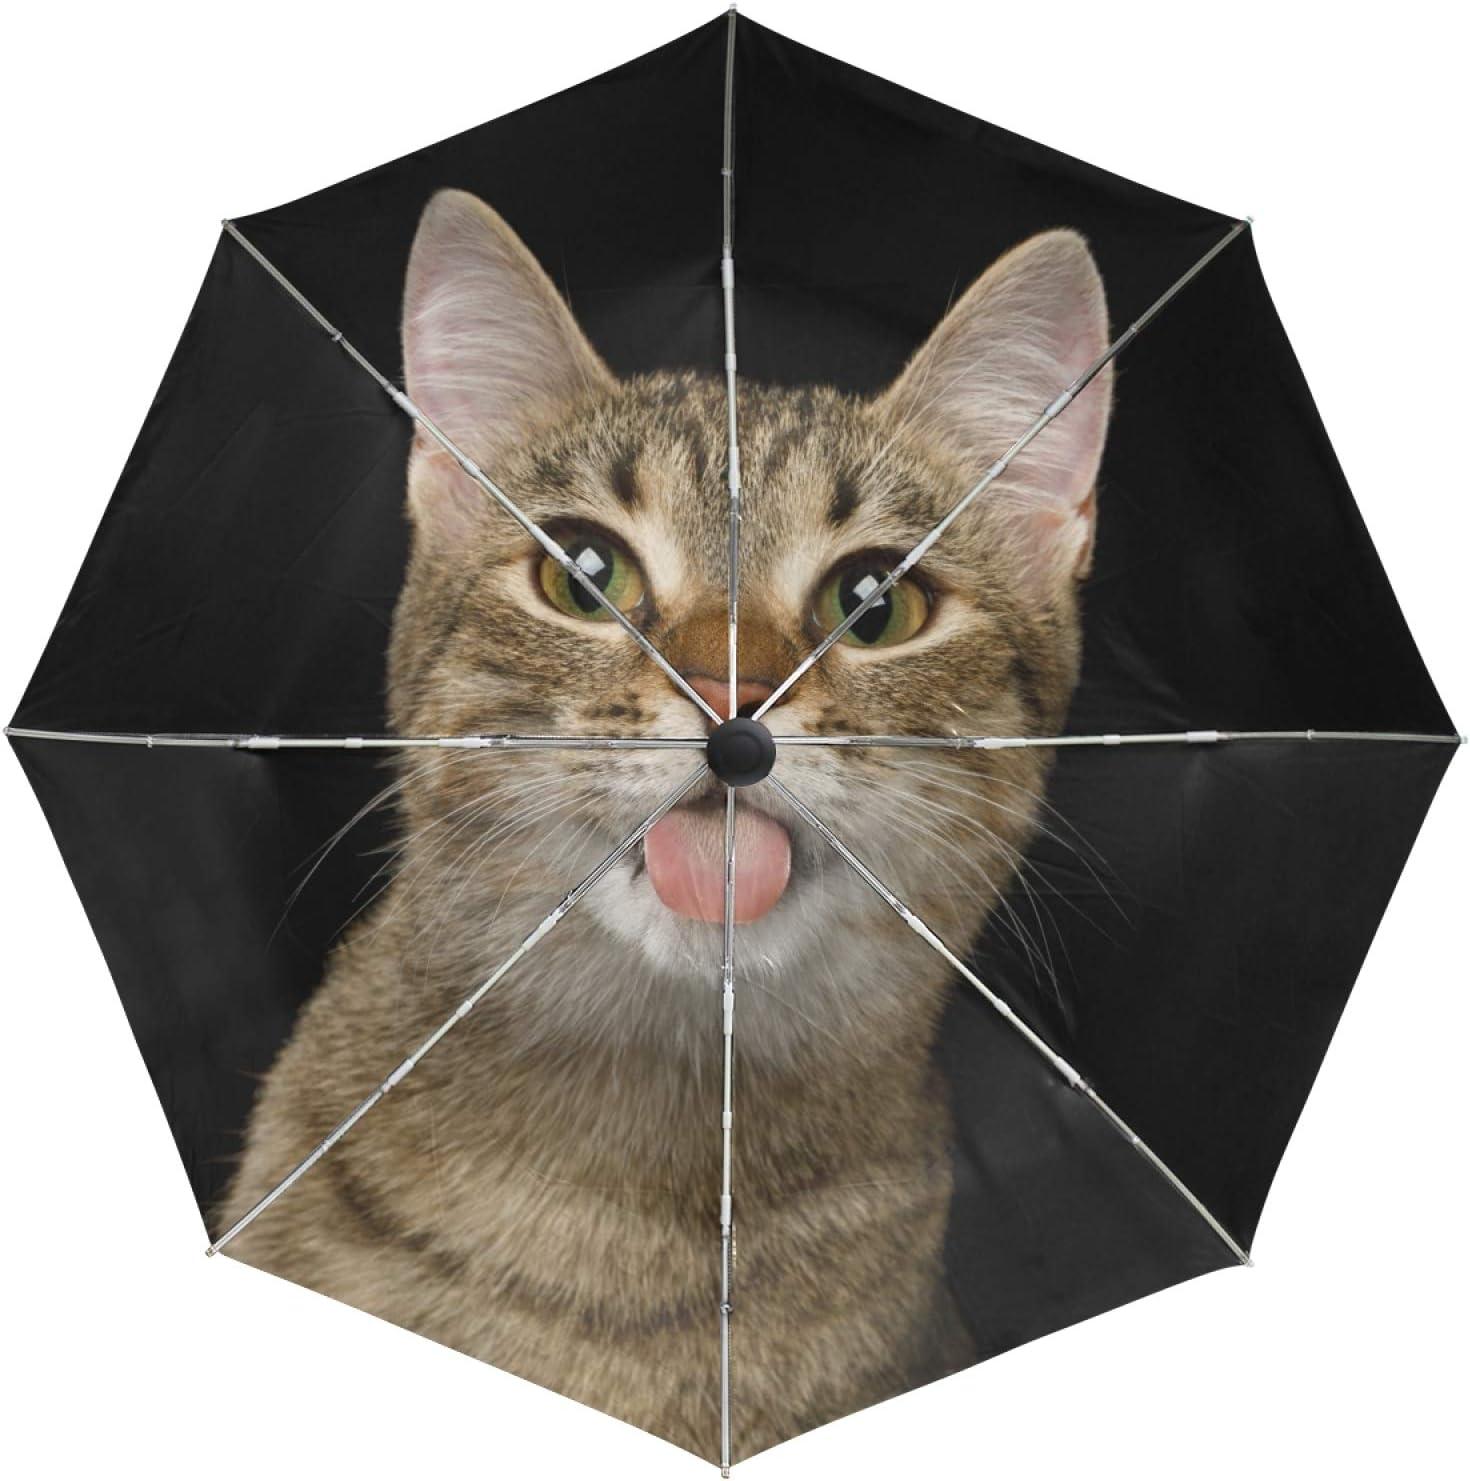 Small Ranking TOP7 Travel Umbrella Windproof Excellence Outdoor Rain Compact Sun Auto UV